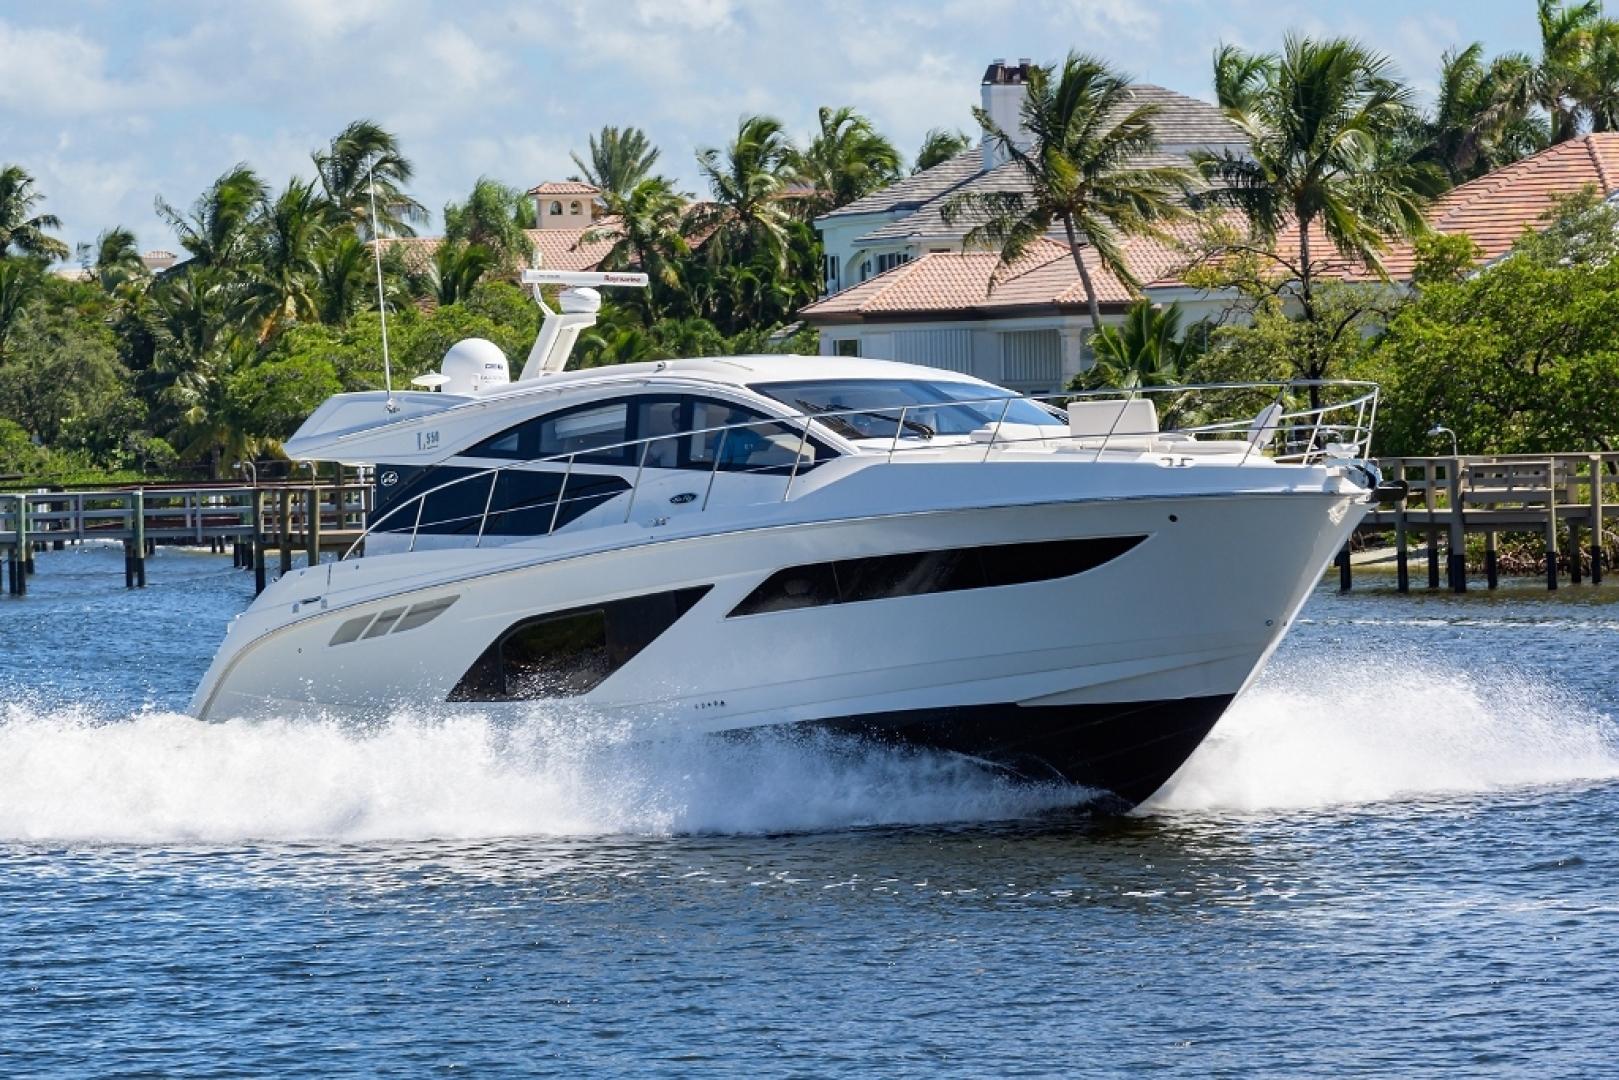 Sea Ray-L 550 2018 -Palm Beach-Florida-United States-1559854 | Thumbnail